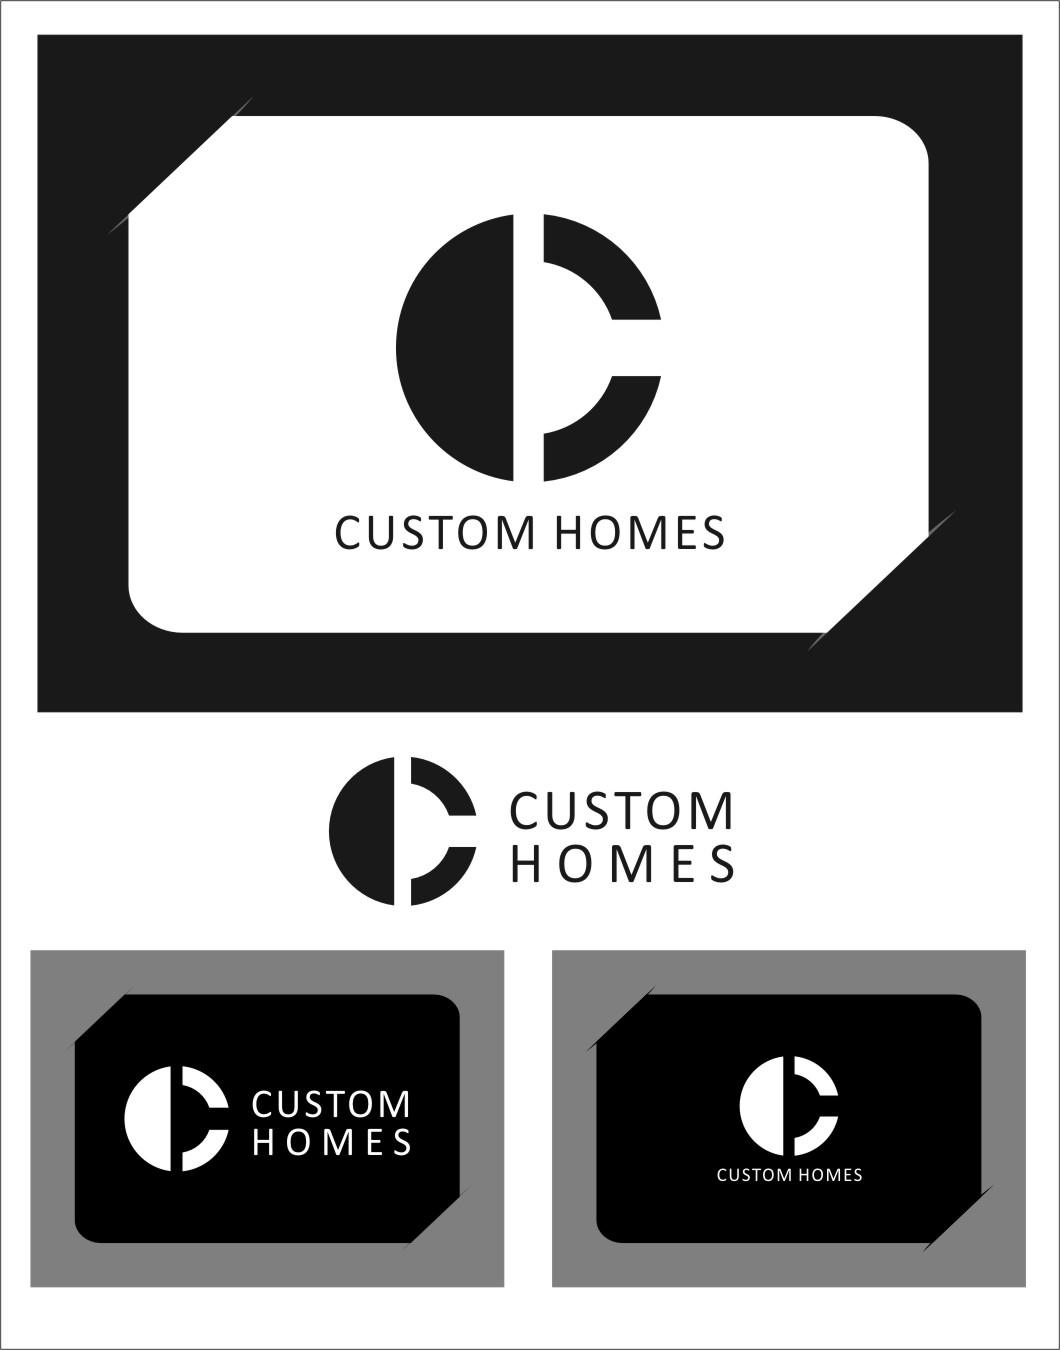 Logo Design by Ngepet_art - Entry No. 265 in the Logo Design Contest Creative Logo Design for DC Custom Homes.